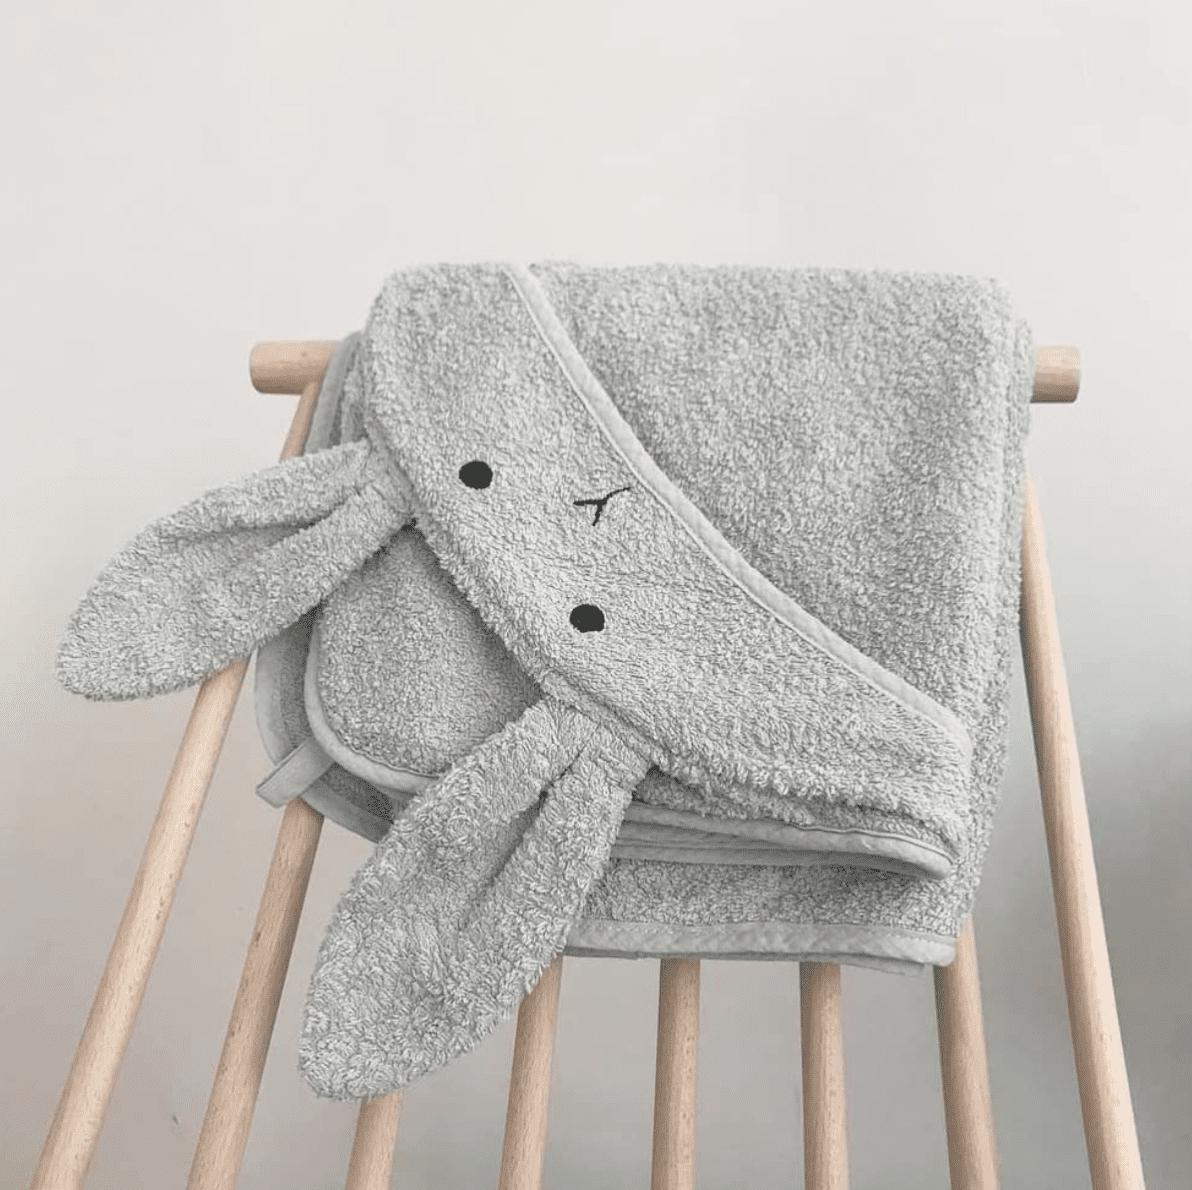 Dusty mint hooded baby towel folded on nursery chair